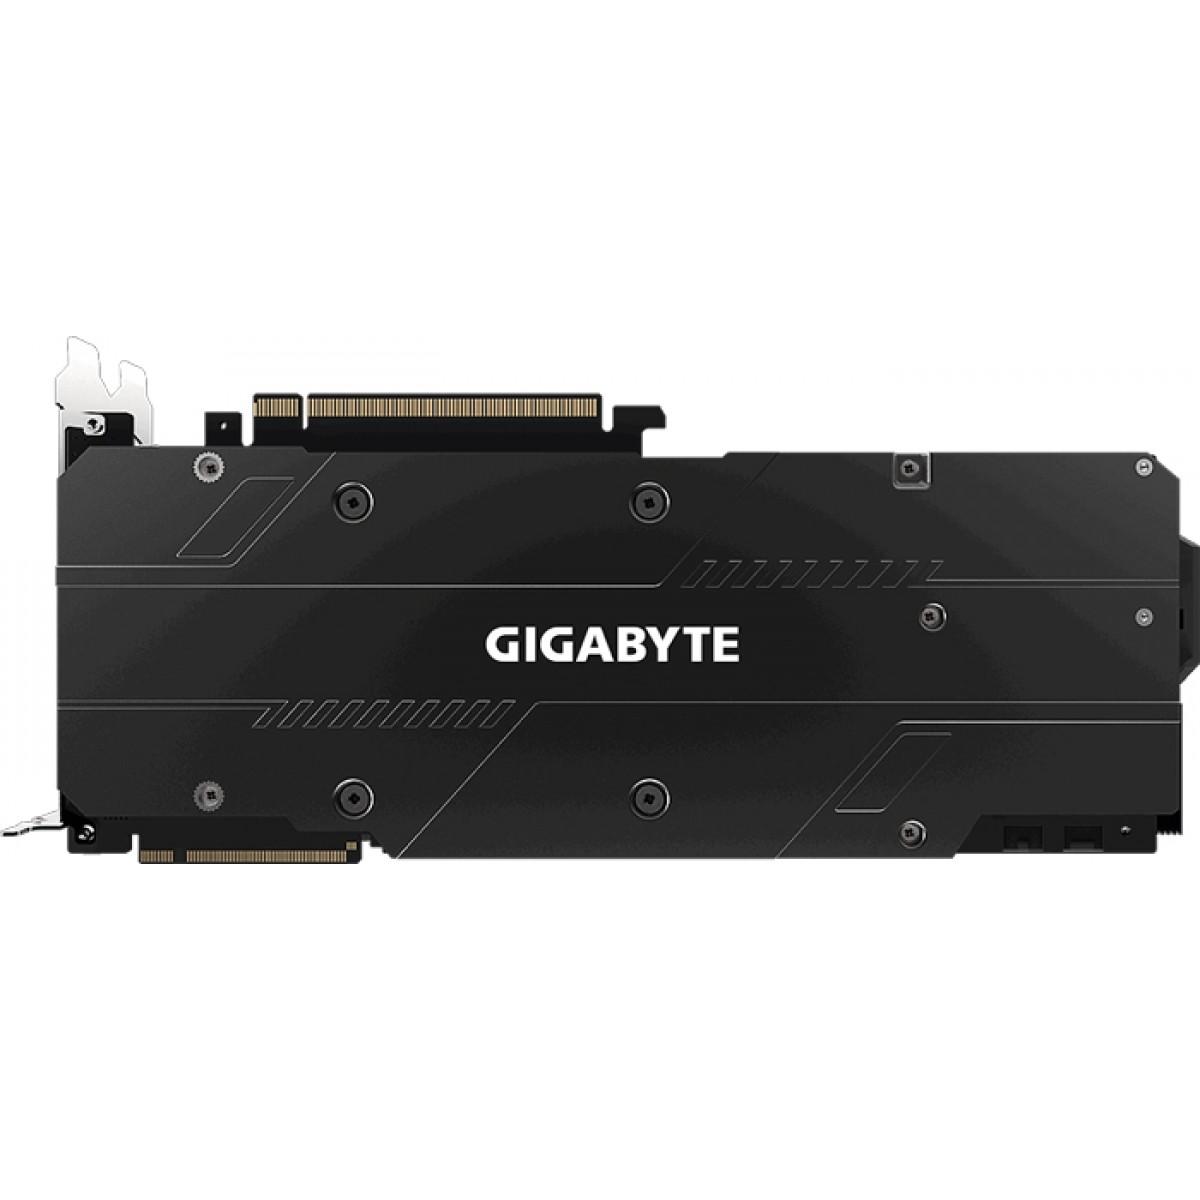 Placa de Vídeo Gigabyte GeForce RTX 2070 Super Gaming OC, 8GB GDDR6, 256Bit